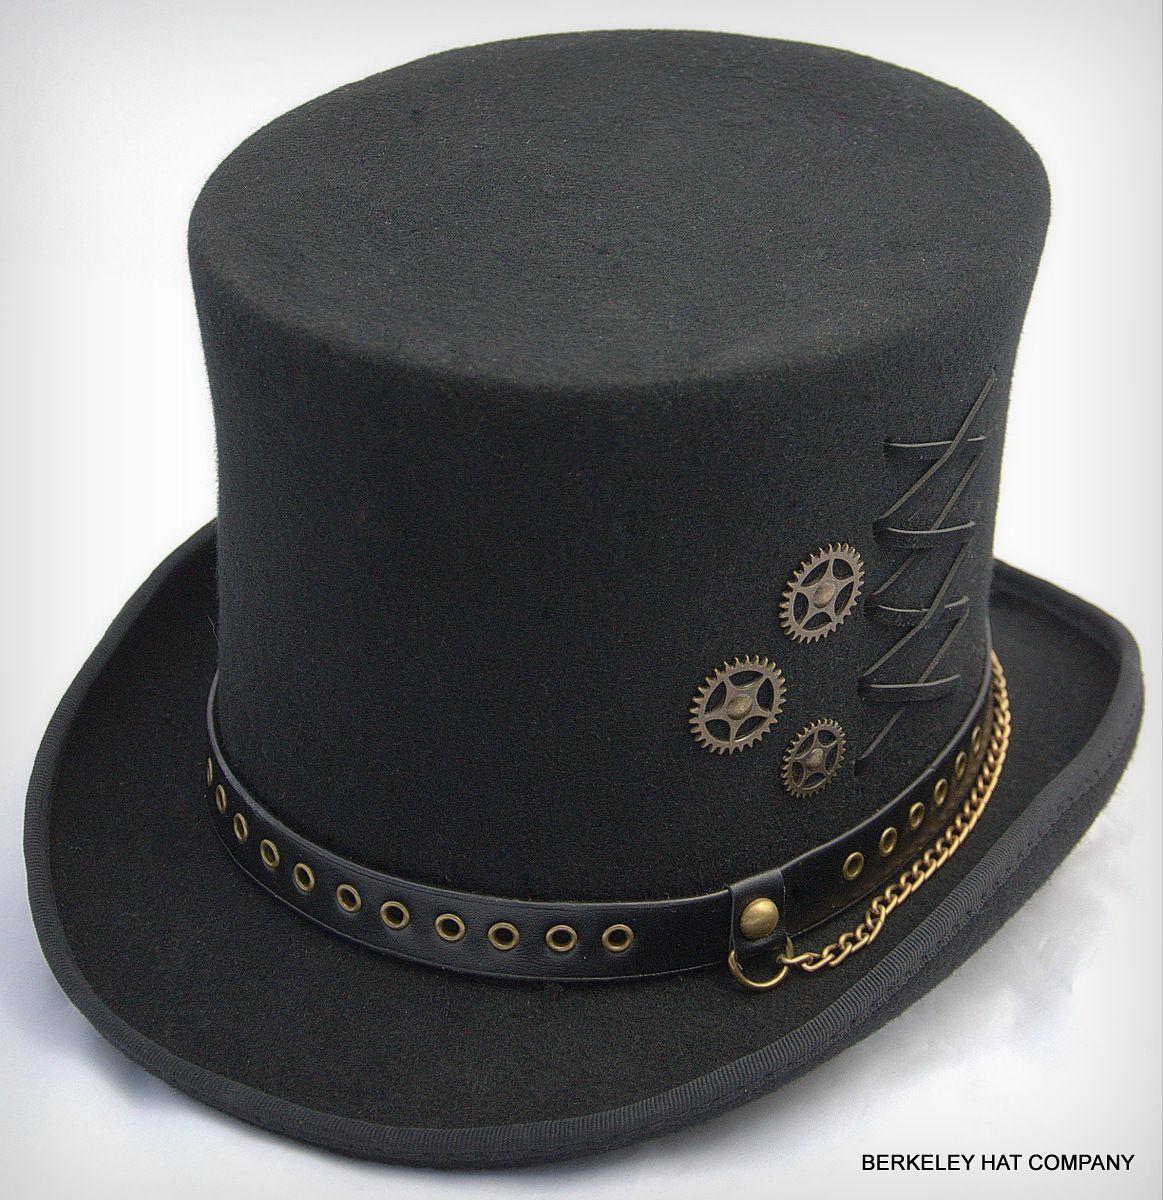 b26177d4402d John | top hats | Steampunk, Steampunk top hat, Steampunk clothing